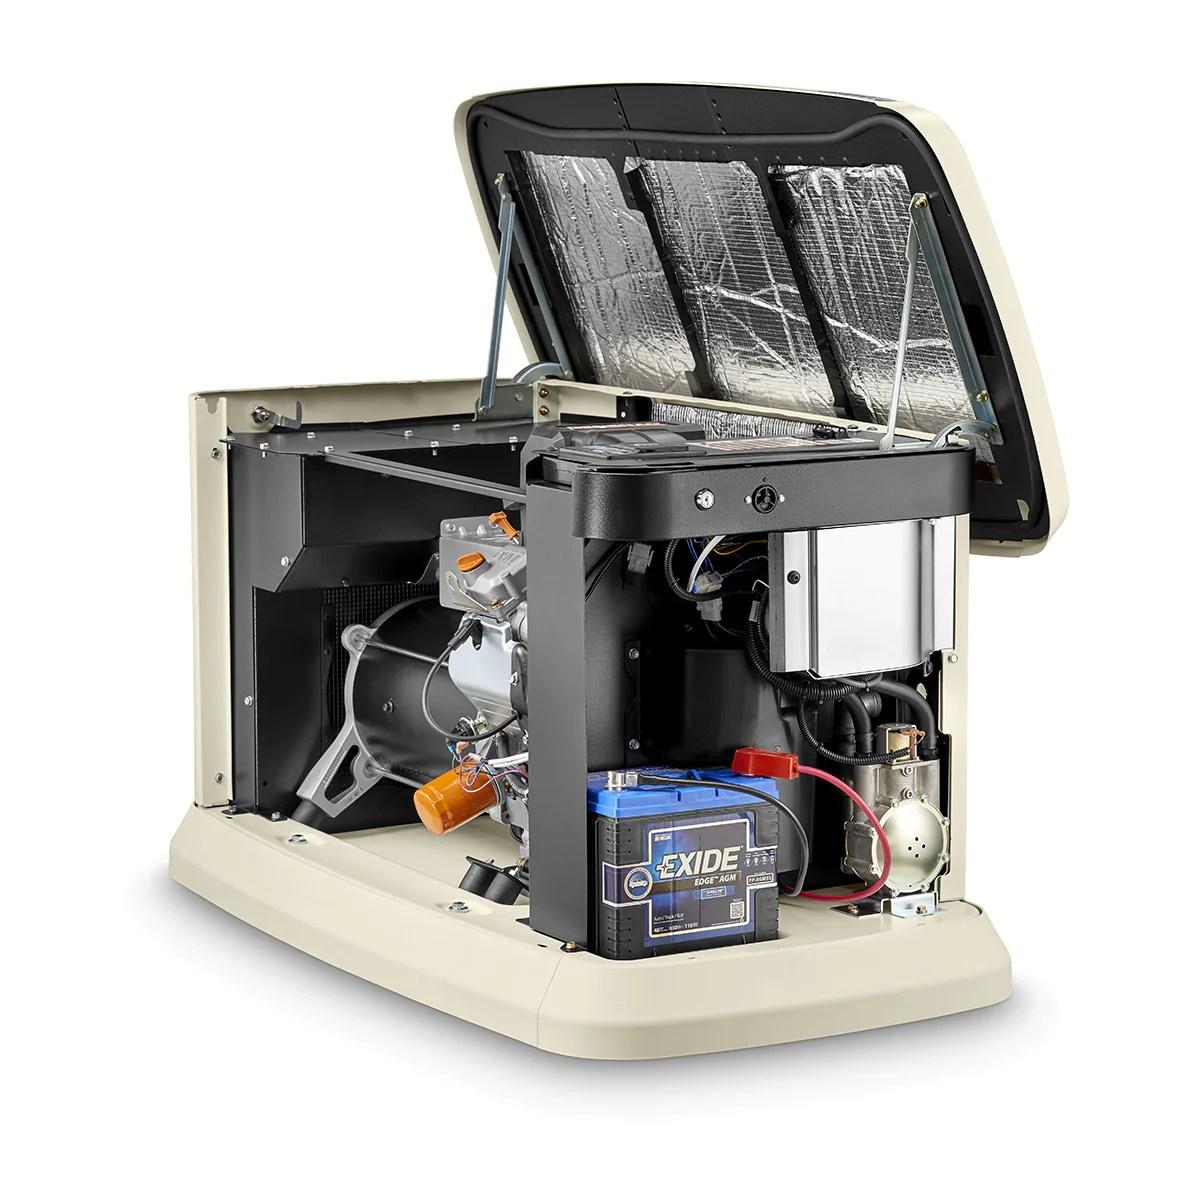 Generac Guardian 7038 20kW Aluminum Automatic Standby Generator – Ziller Electric